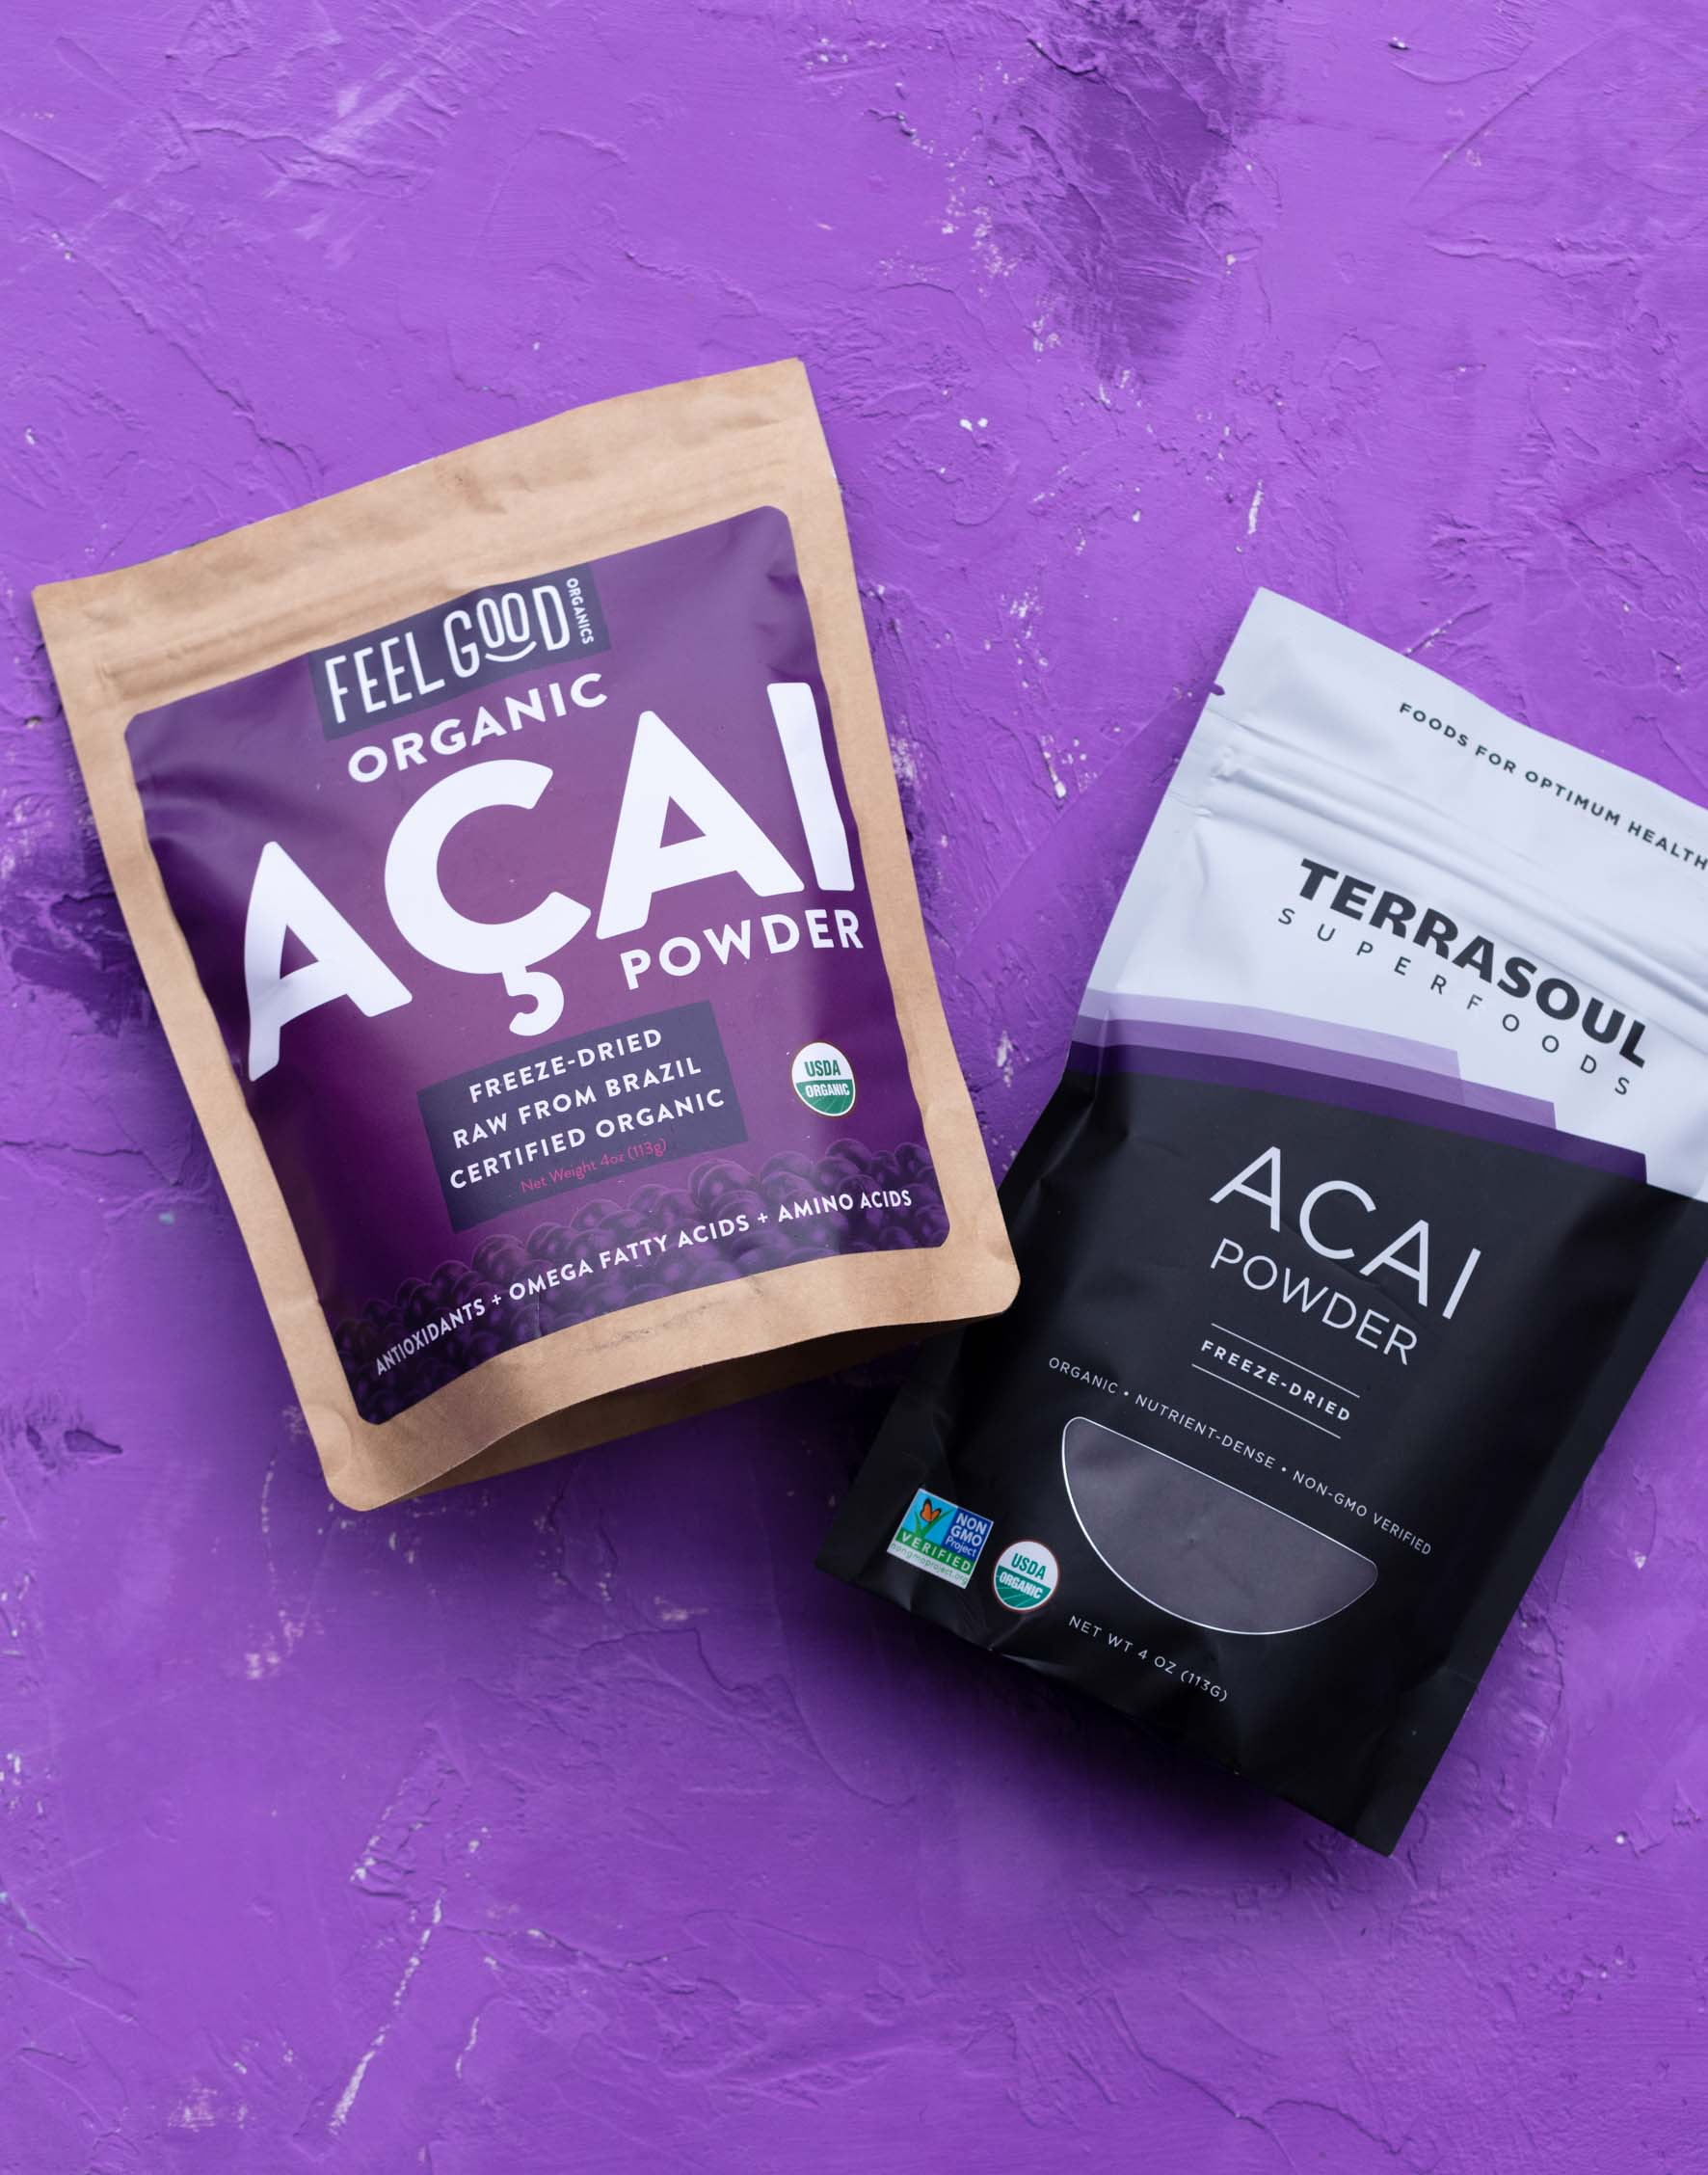 Terrasoul and Feel Good Organics acai berry powder